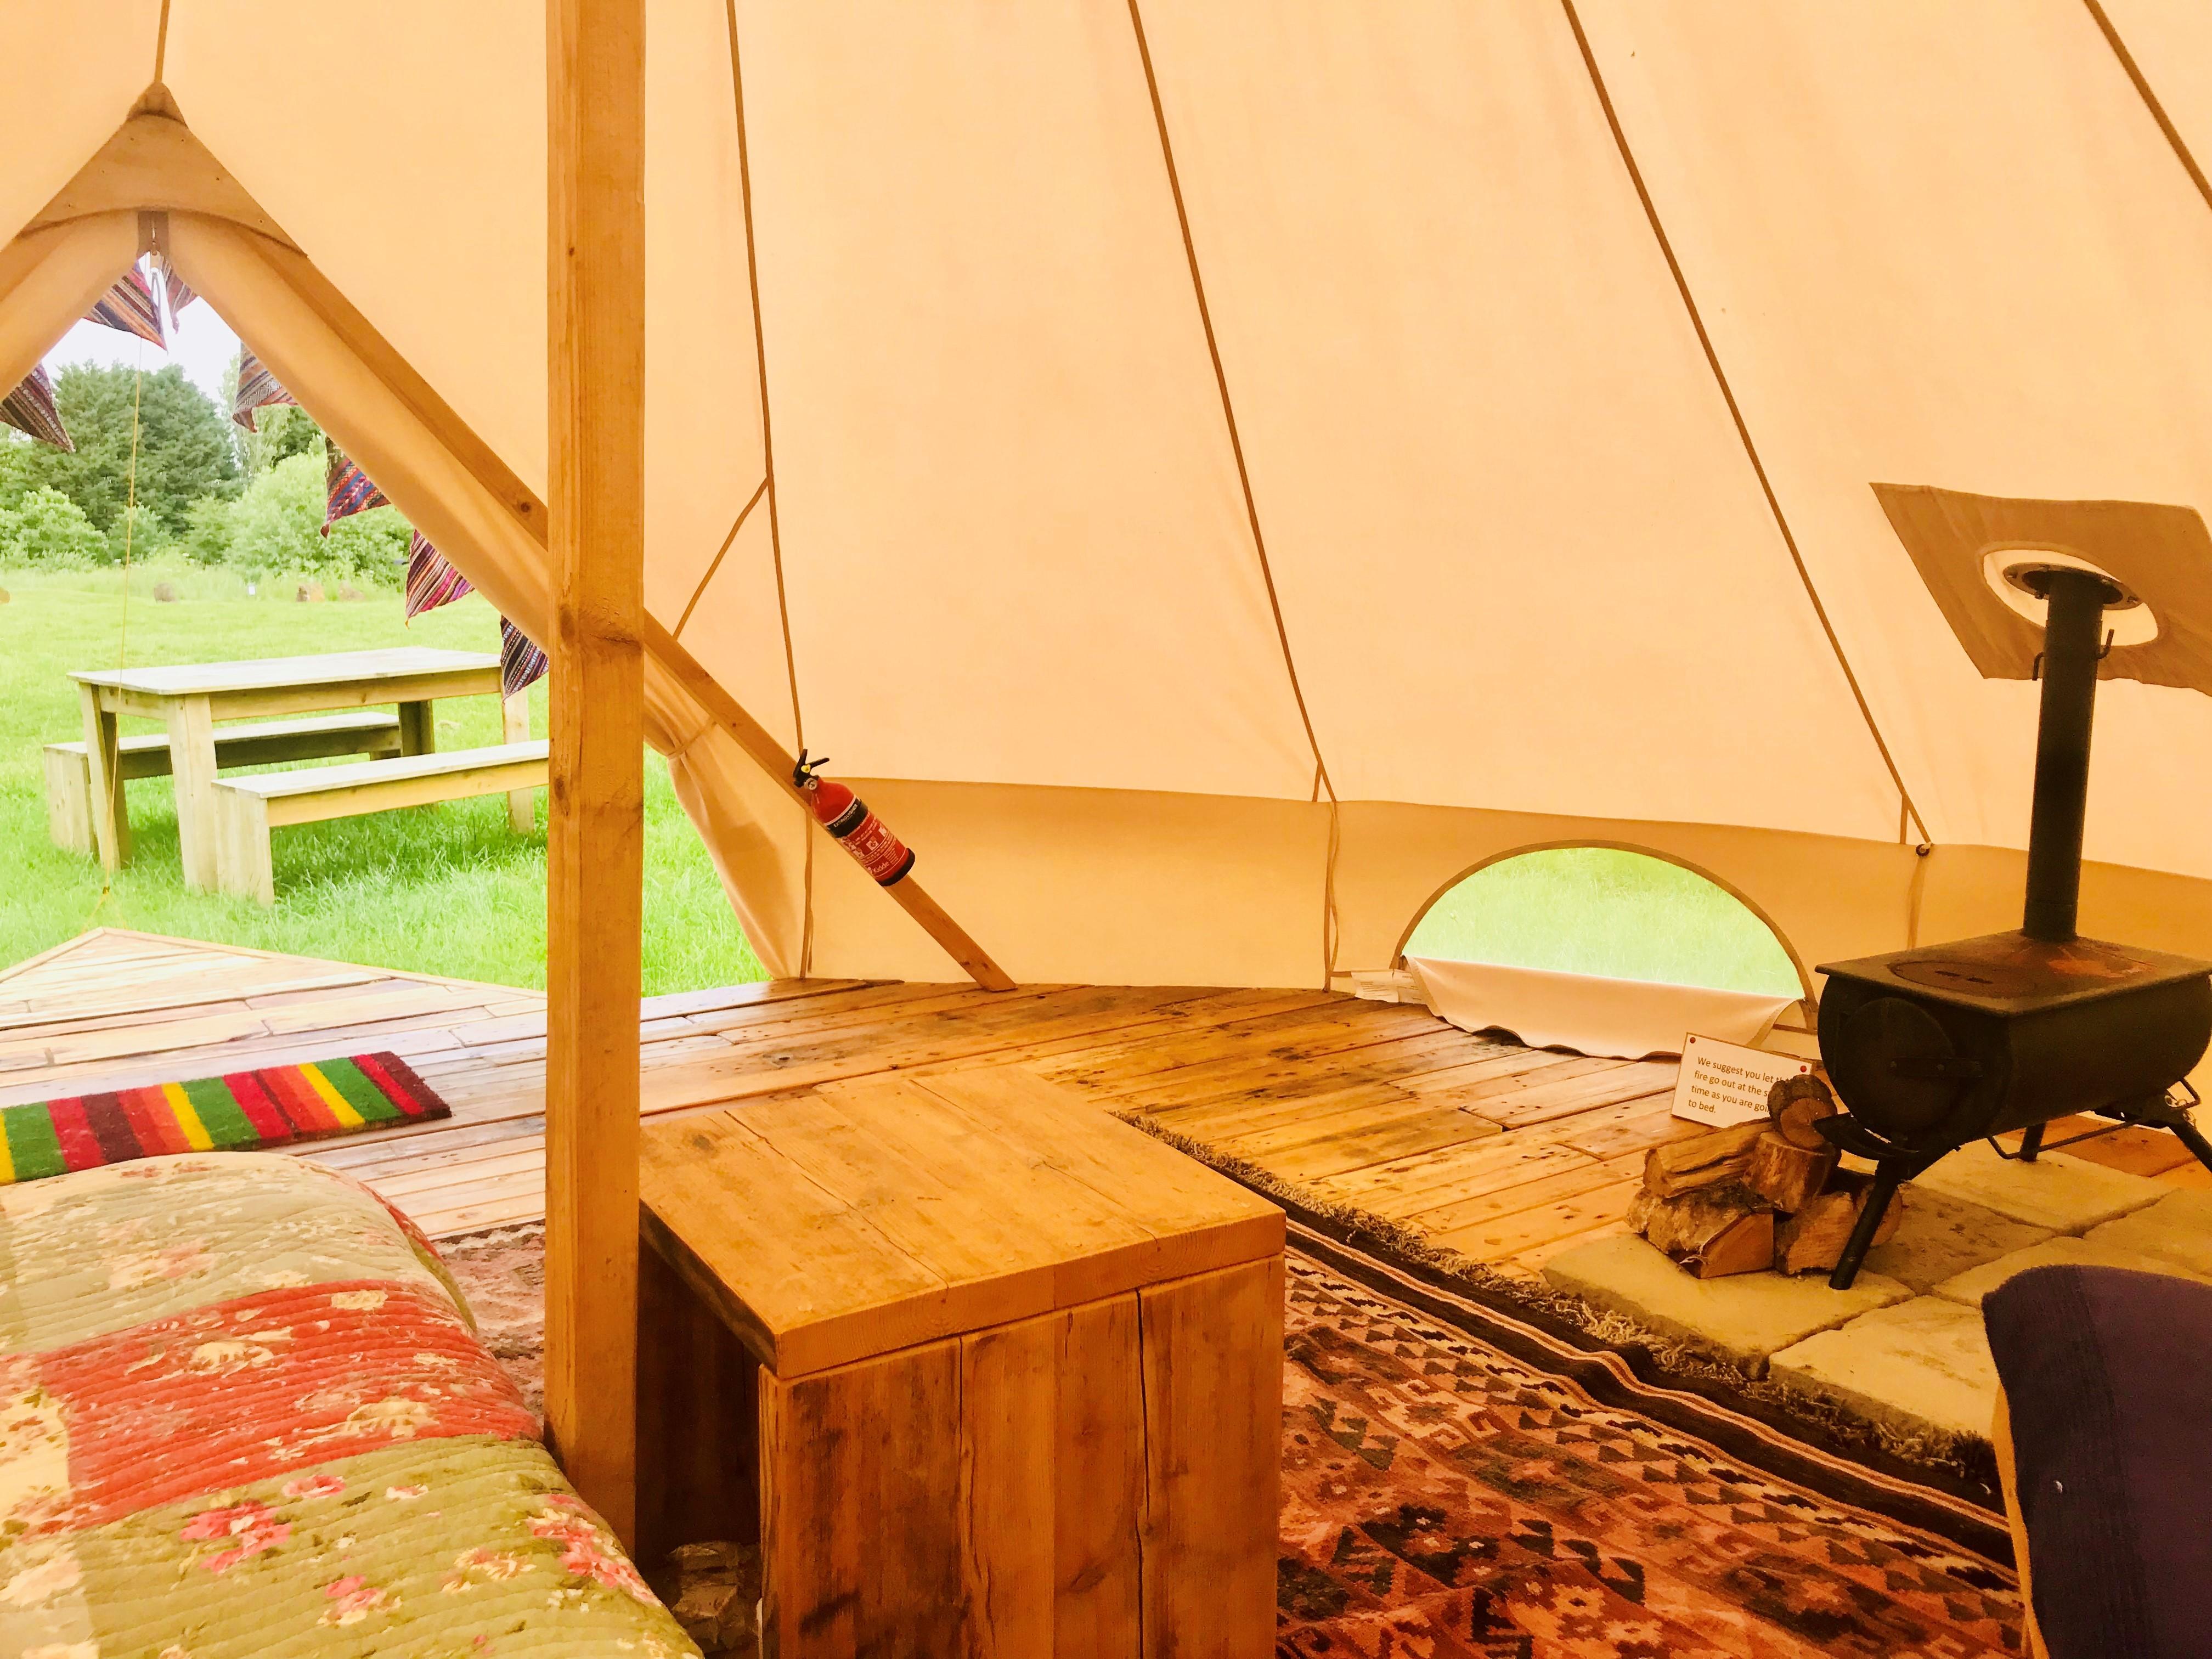 Bell tent burner